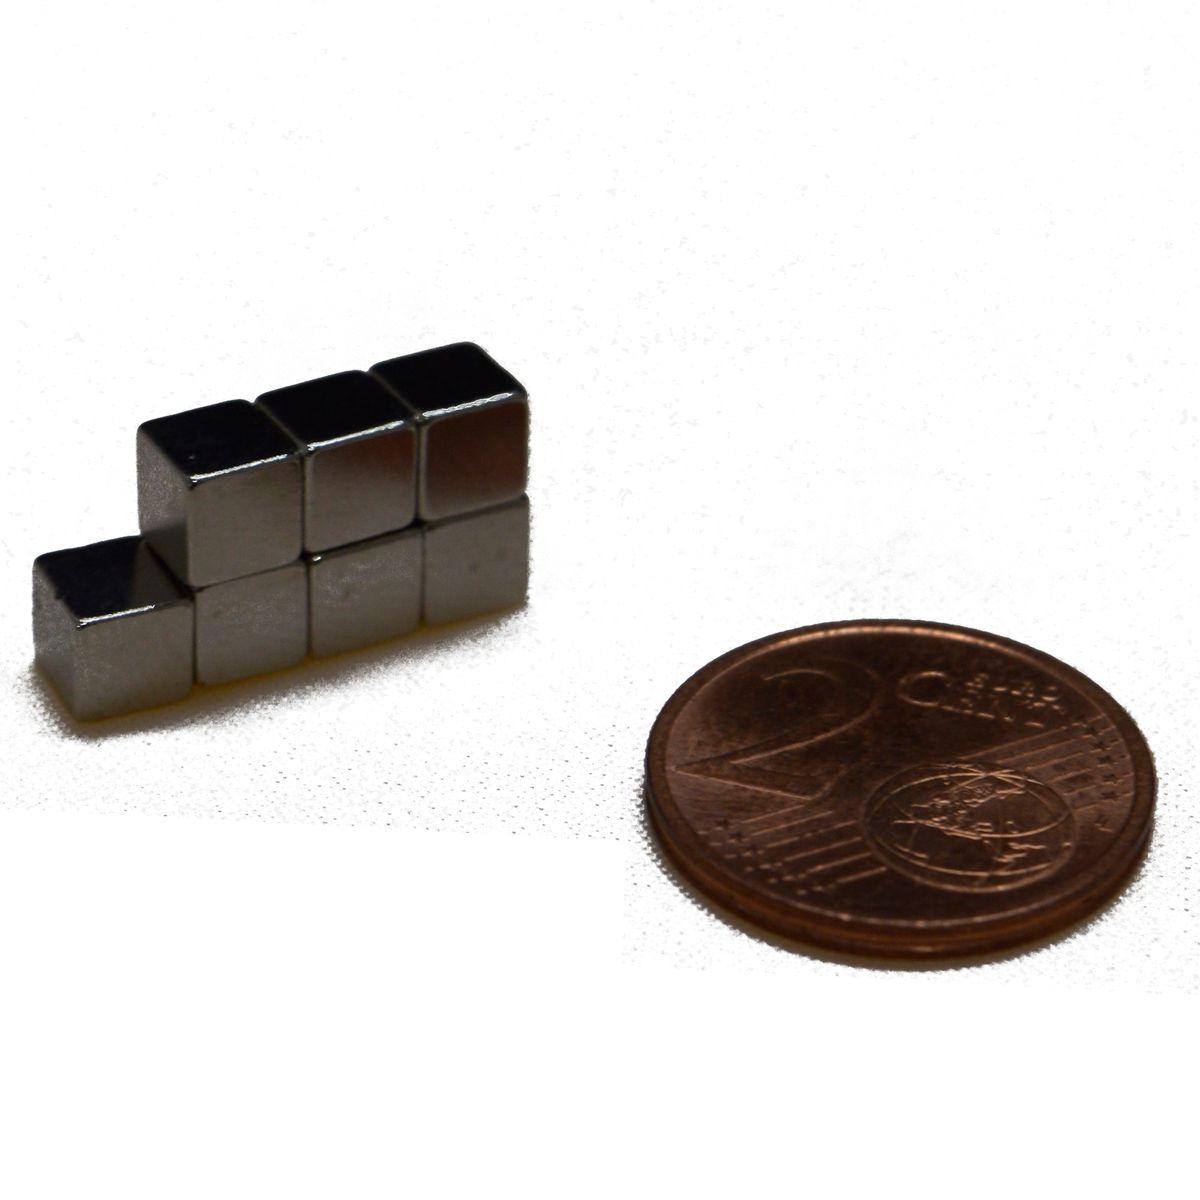 Neodym Würfel Magnete Super Magneten *Aktionspreis* Pinnwand Büro 5 x 5 x 5 mm